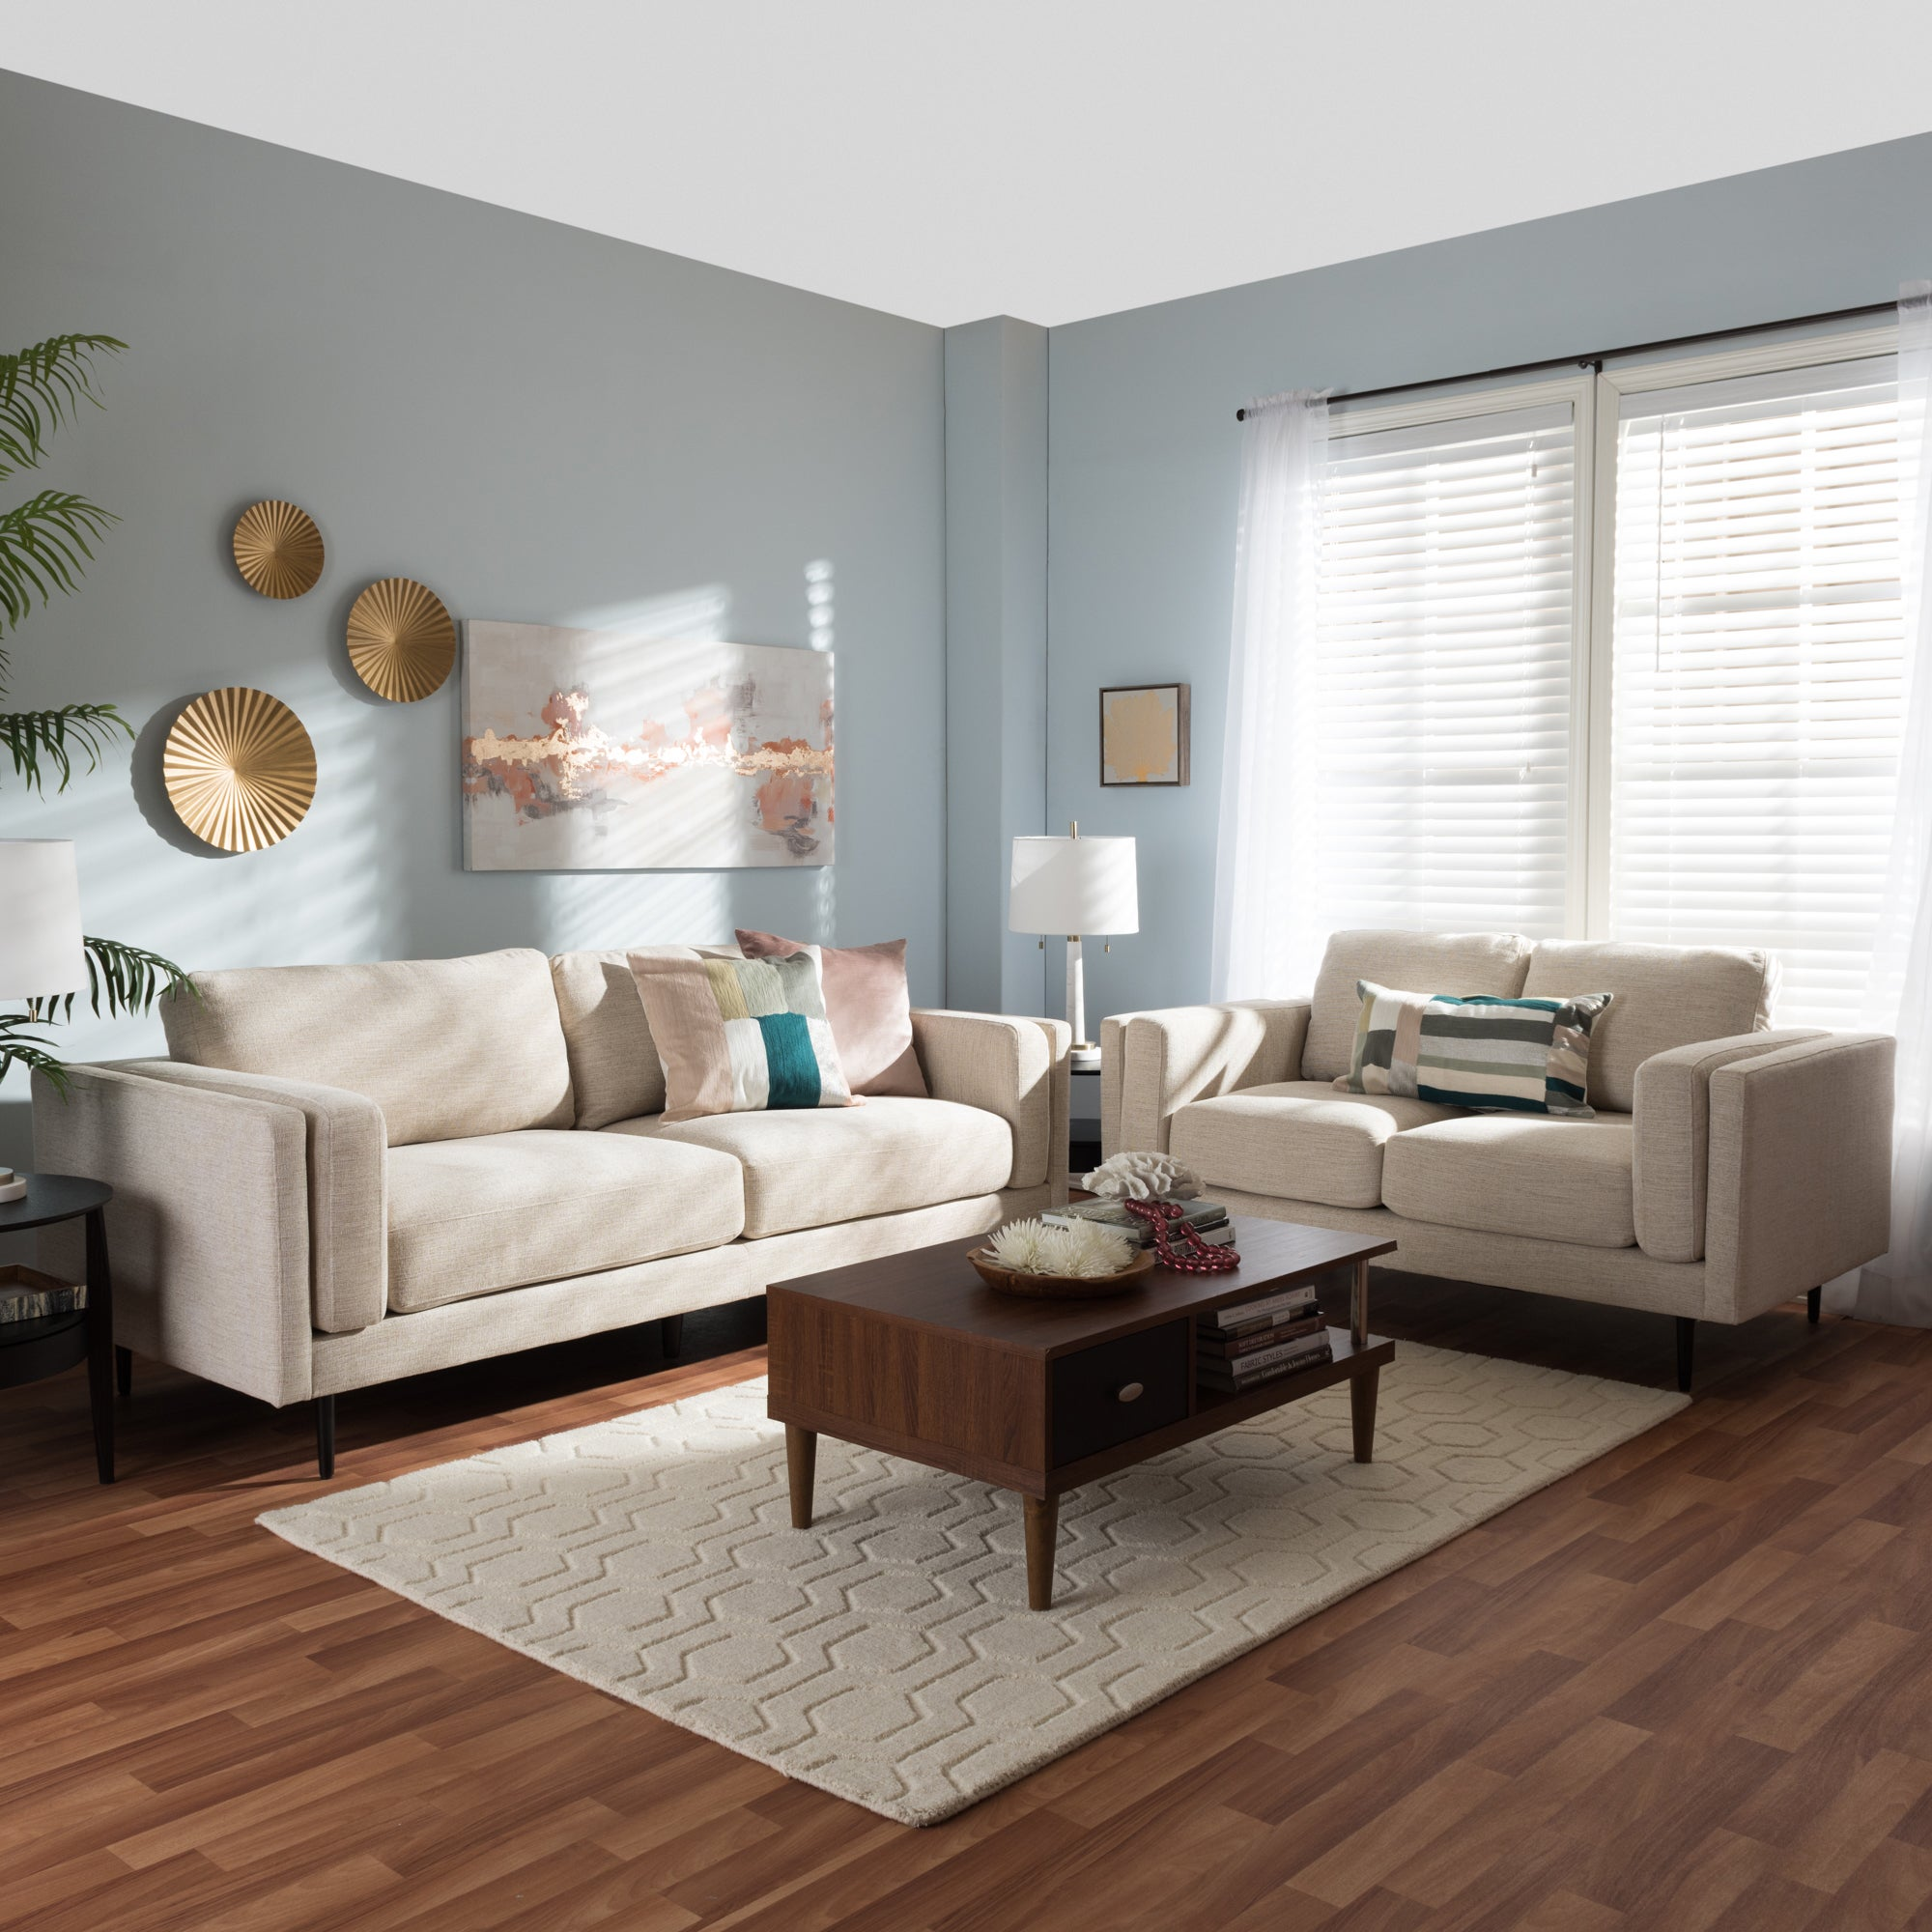 Baxton studio eurybia mid century modern upholstered living room sofa set